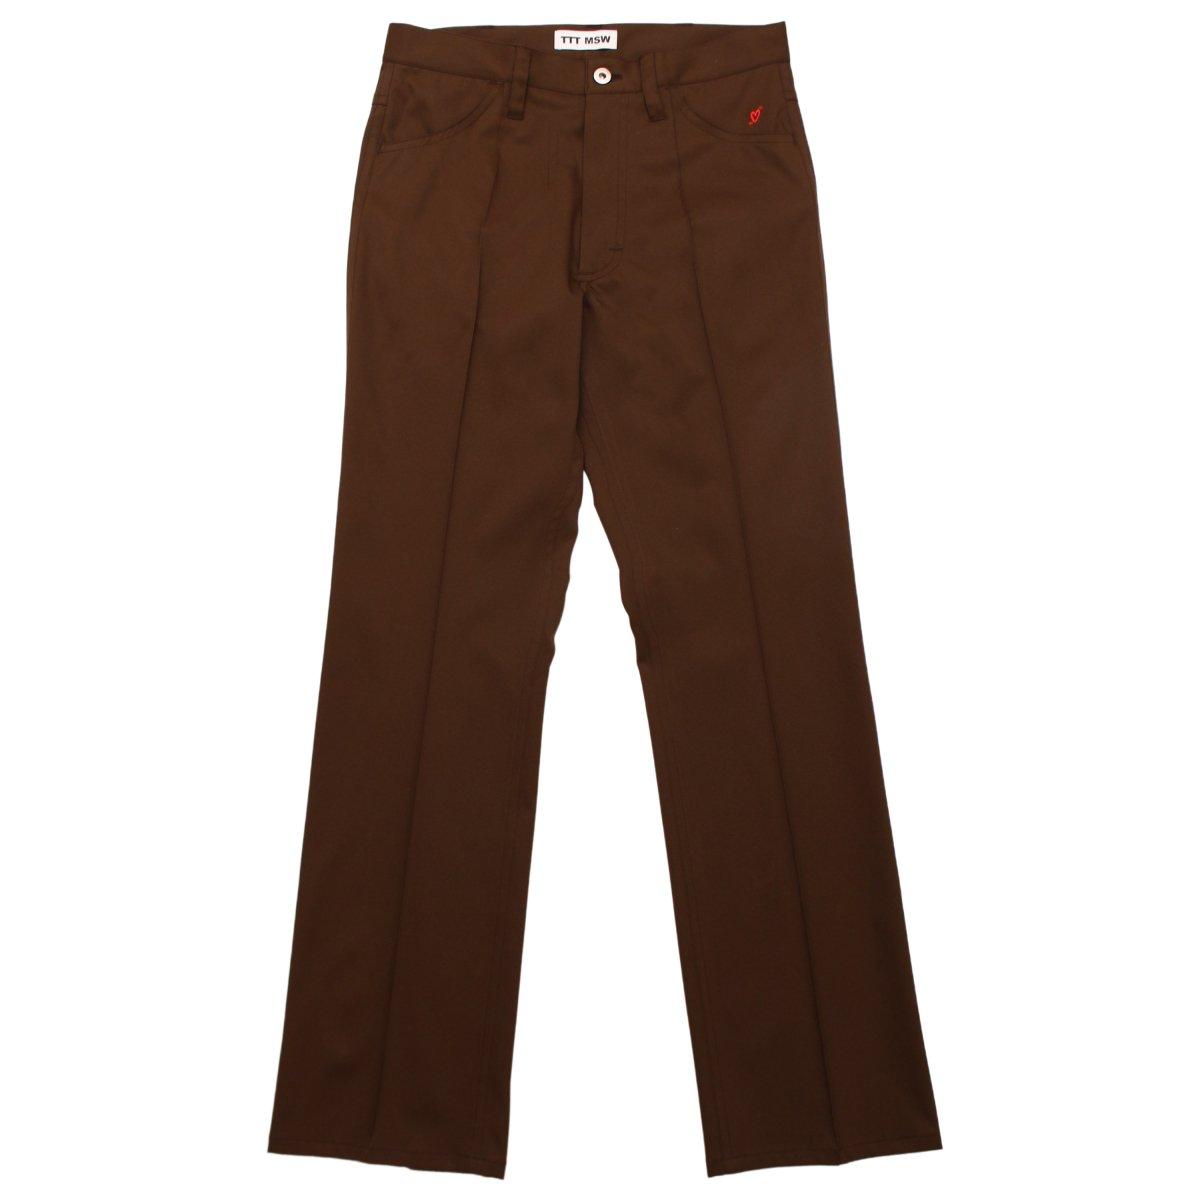 New standard pants 【BROWN】